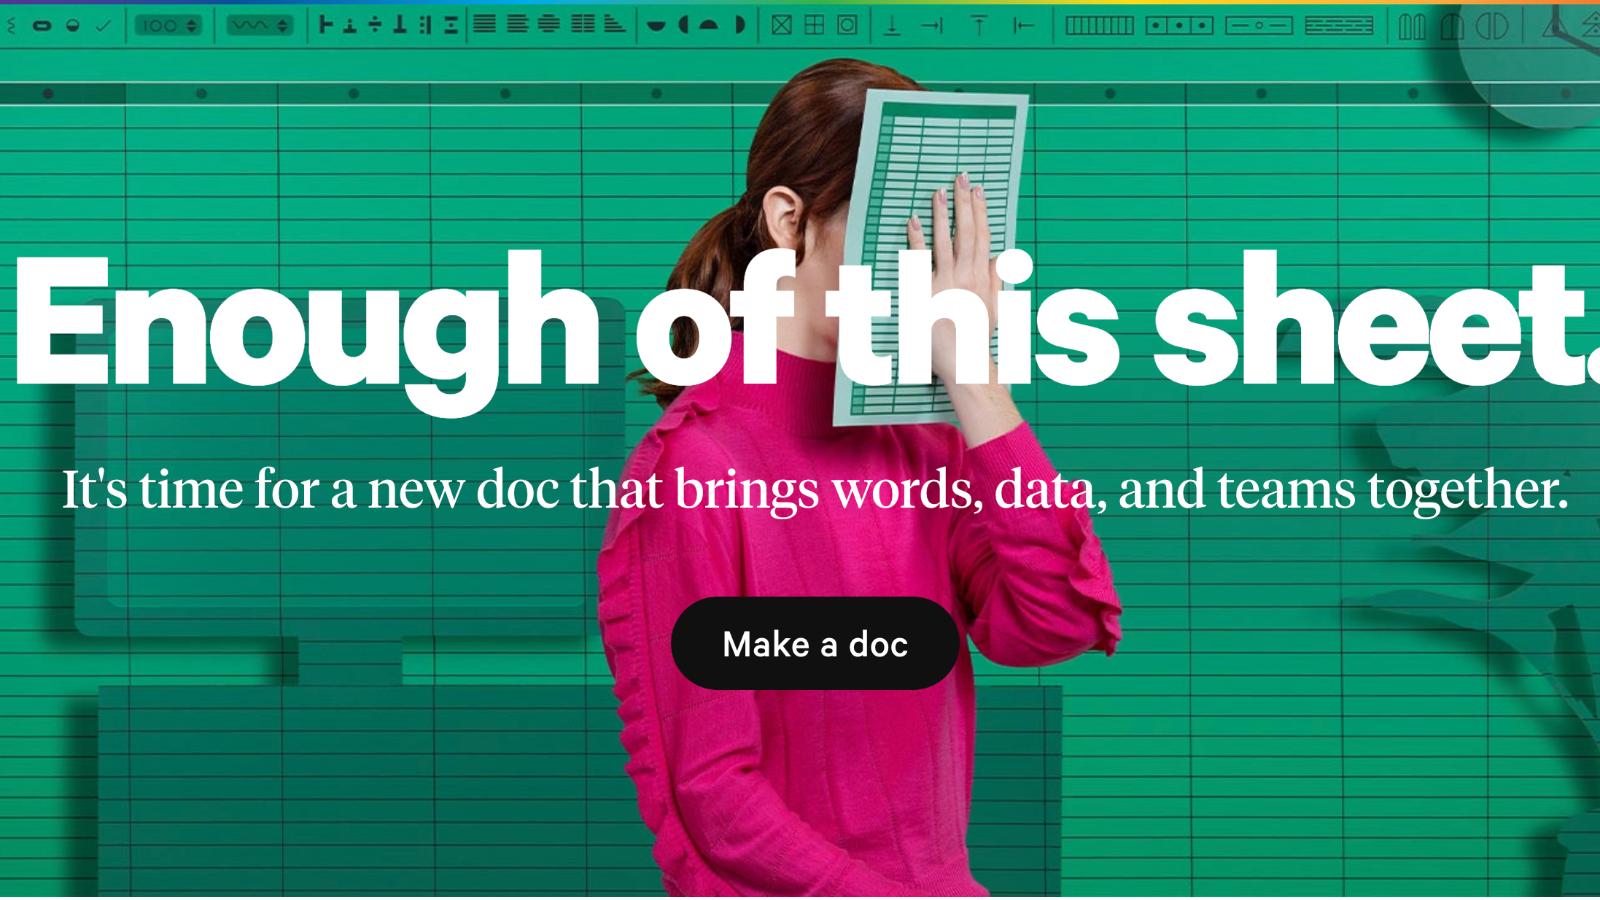 MicrosoftとGoogleに挑む、次世代オールインワンドキュメント作成プラットフォームCoda